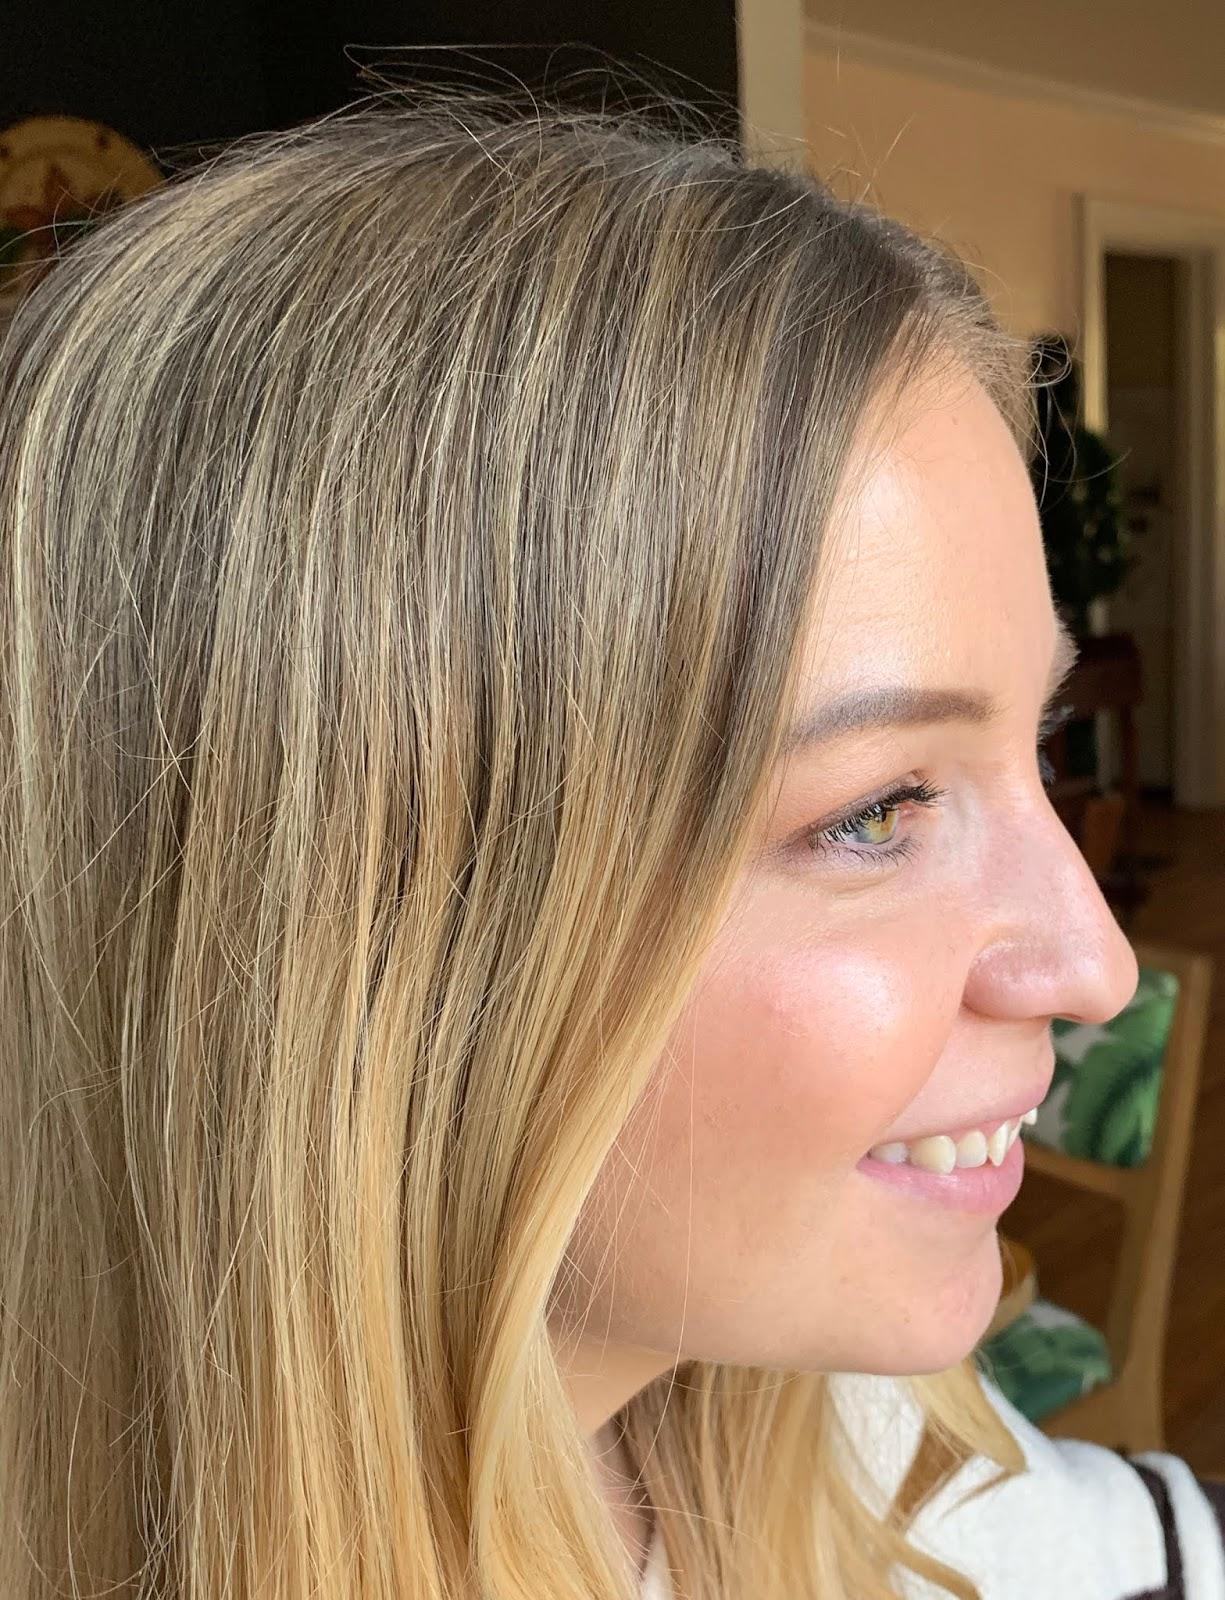 SmileLove Aligner Treatment: Before + After